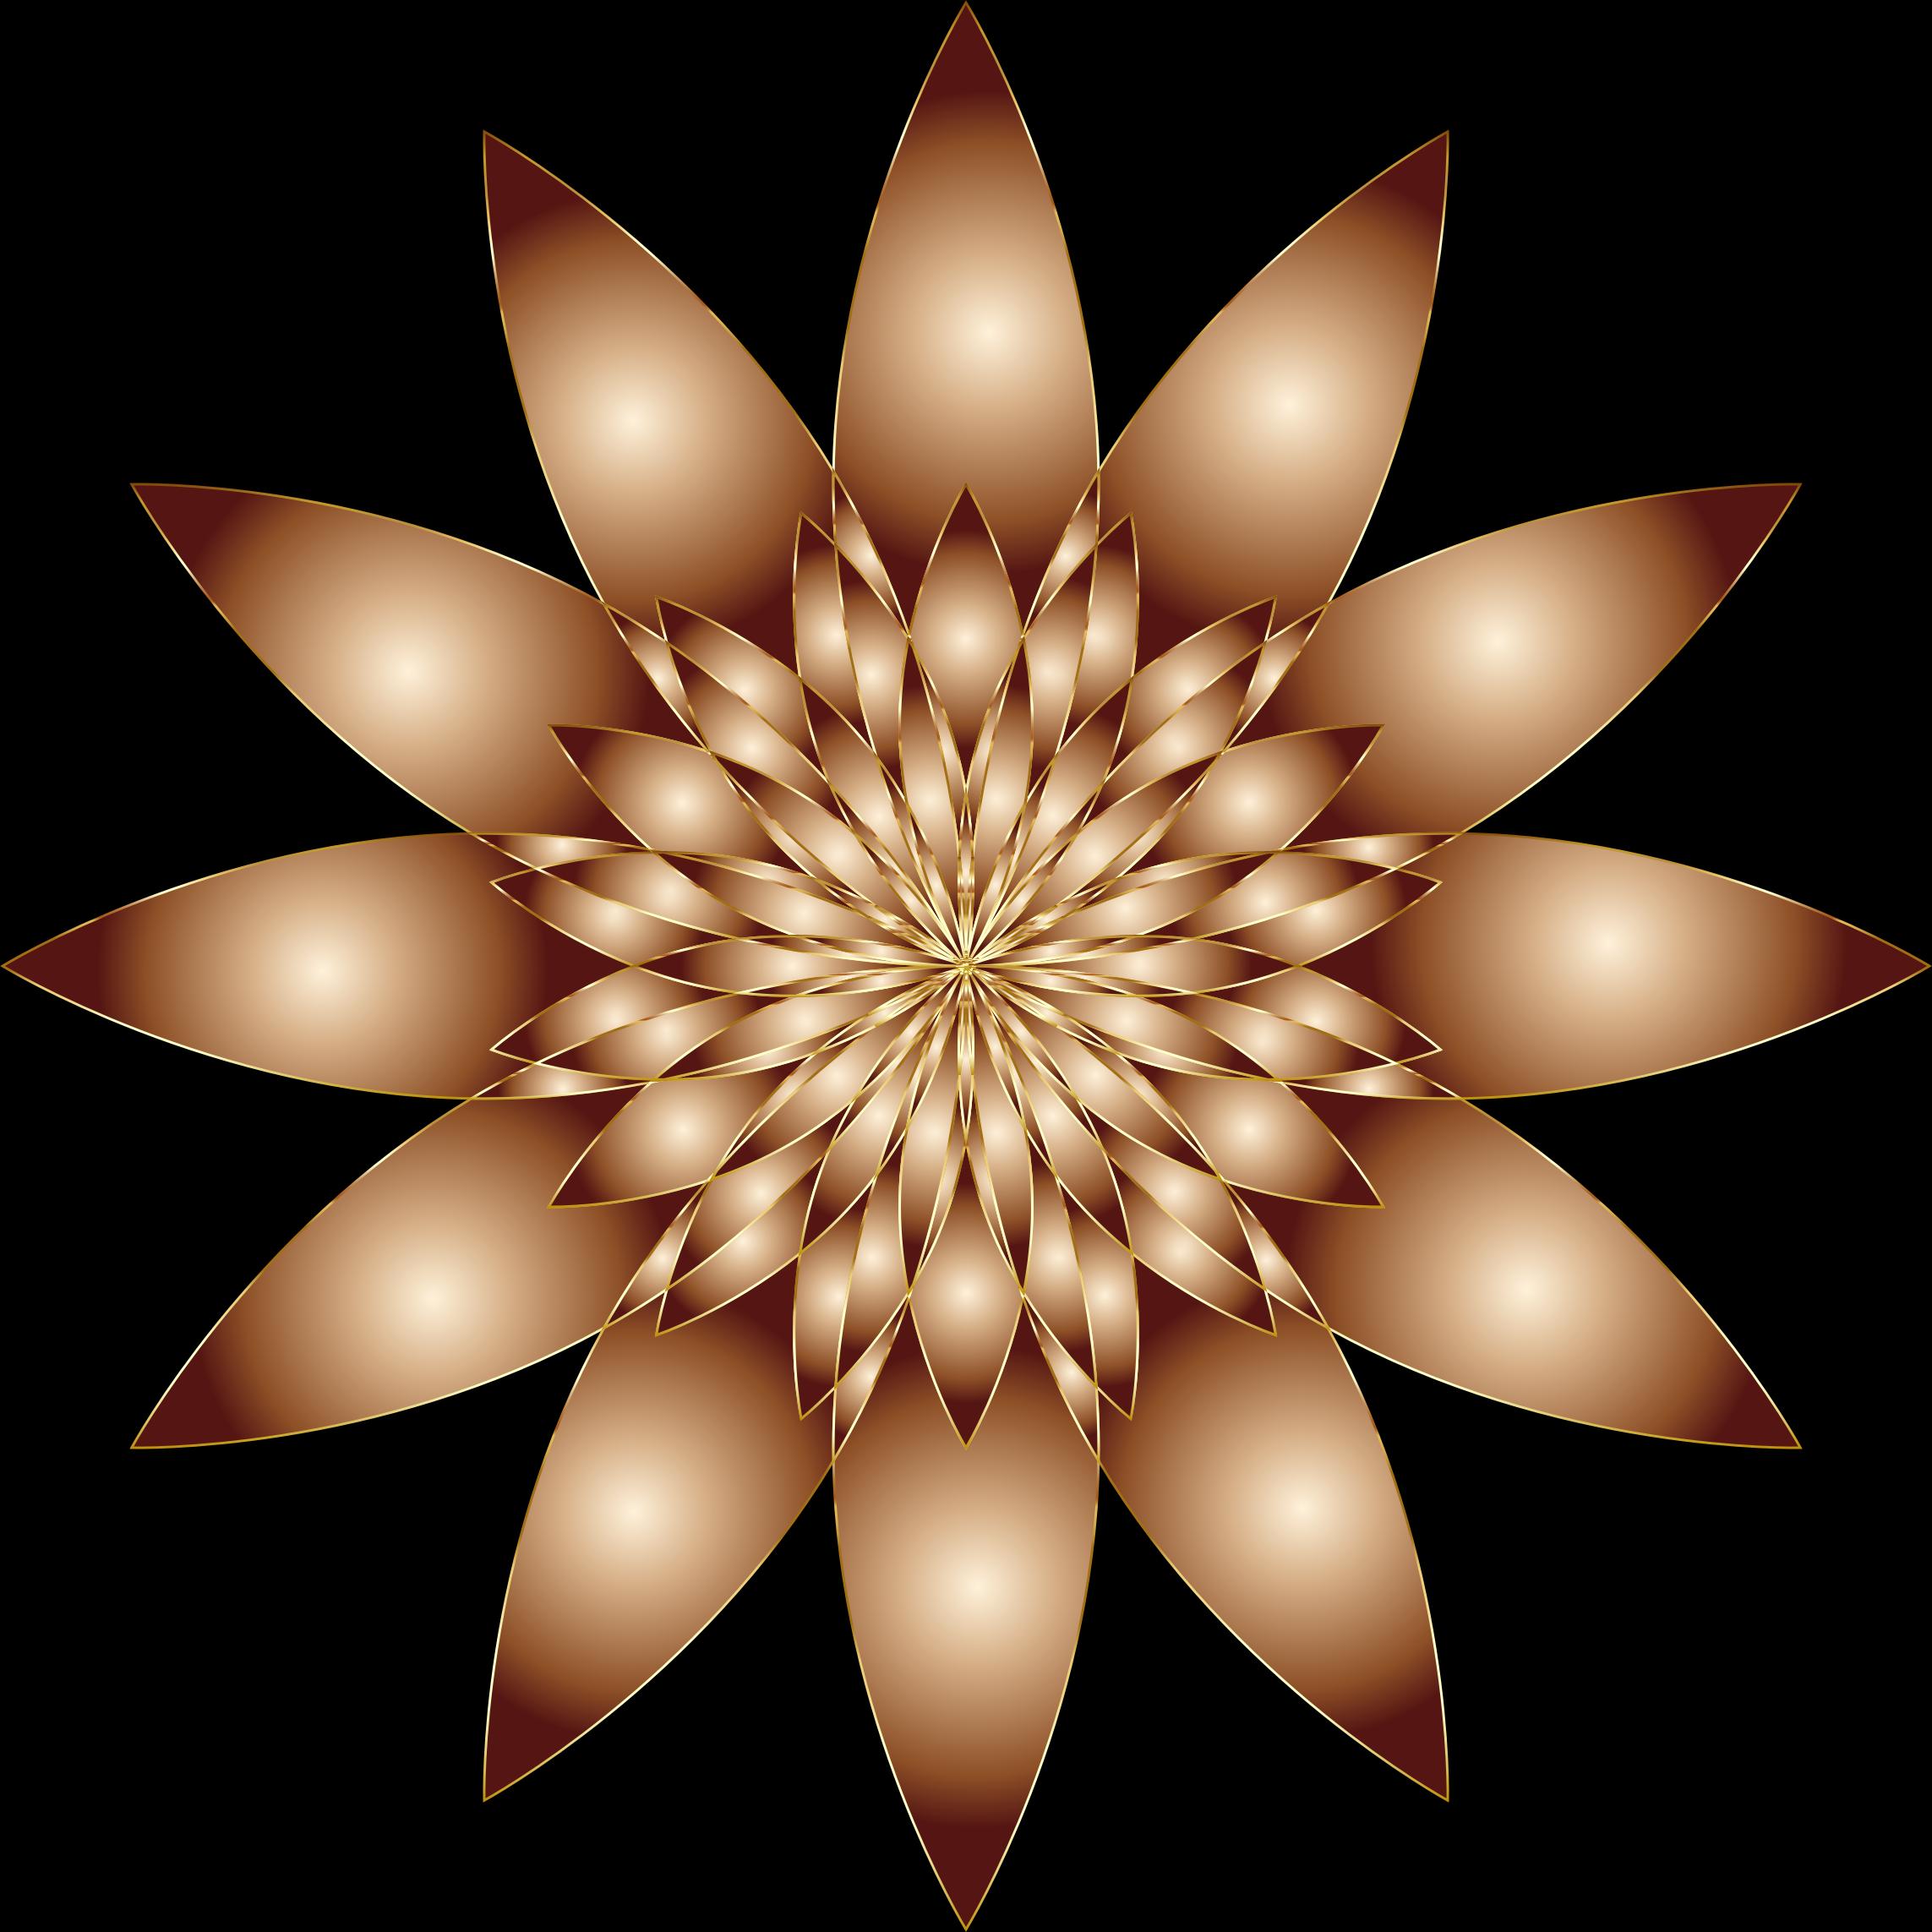 Geometric flower clipart svg transparent download Clipart - Chromatic Flower 10 No Background svg transparent download